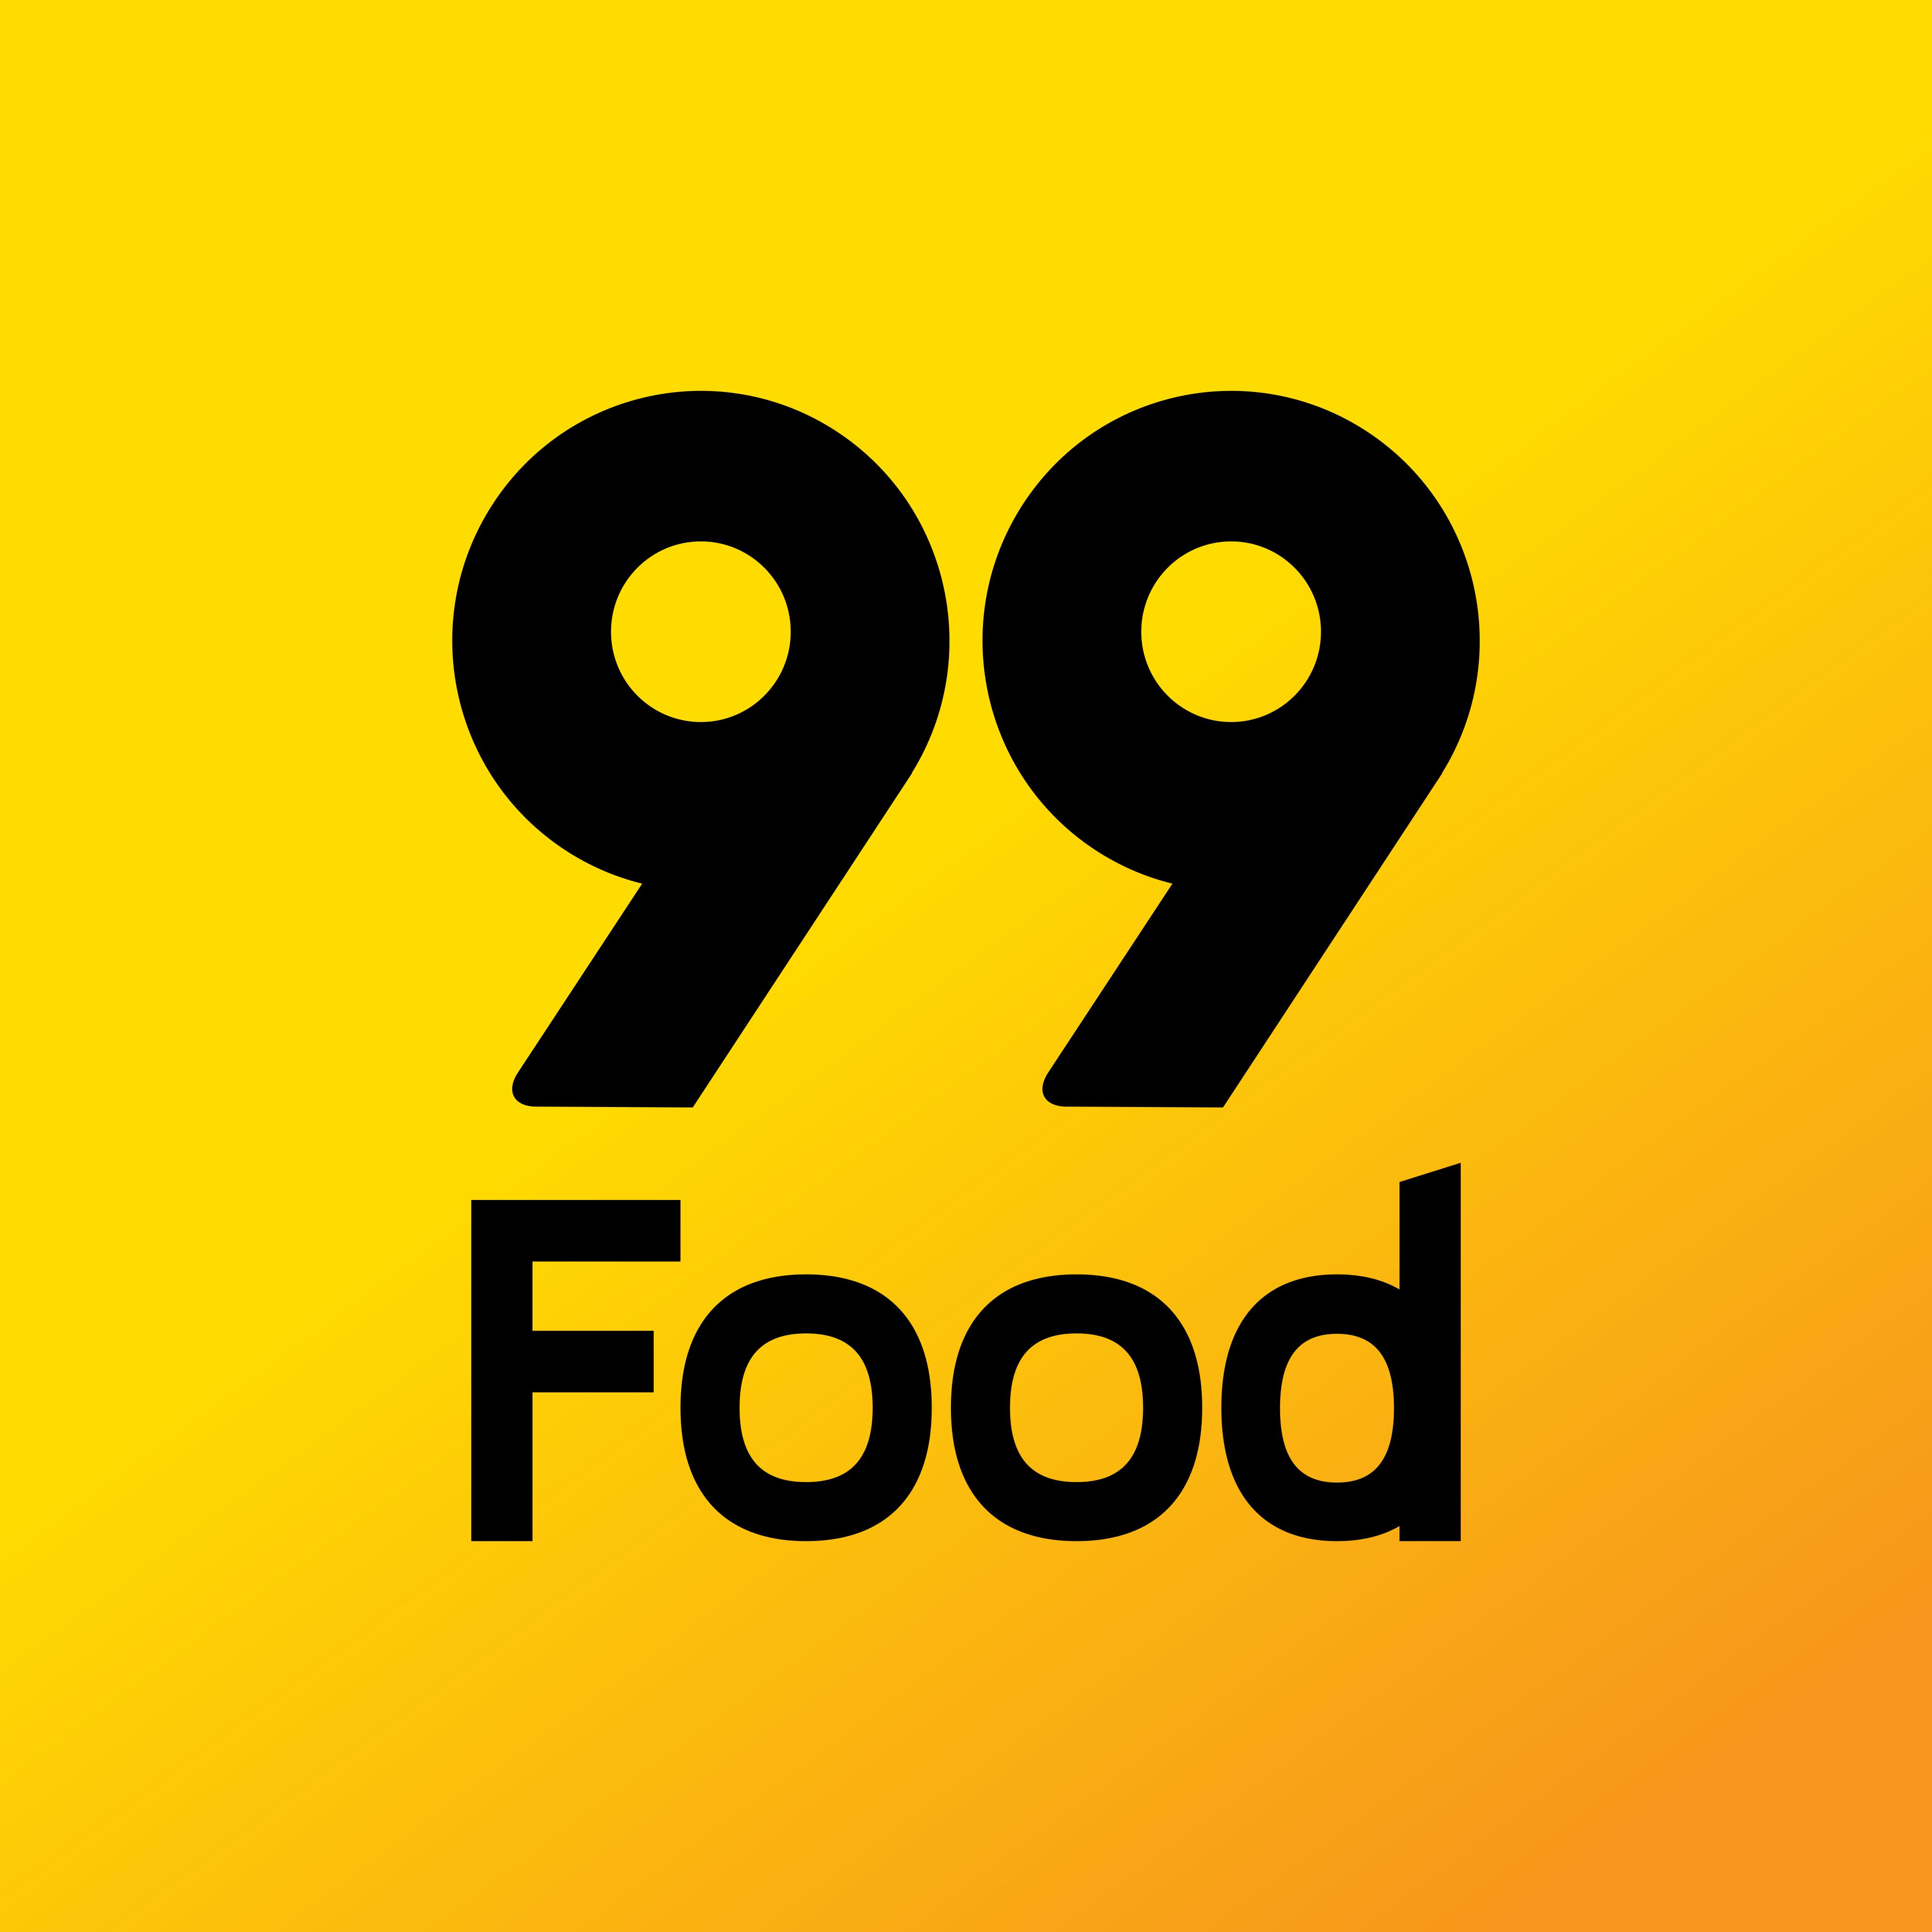 99 food logo 1 - 99 Food logo